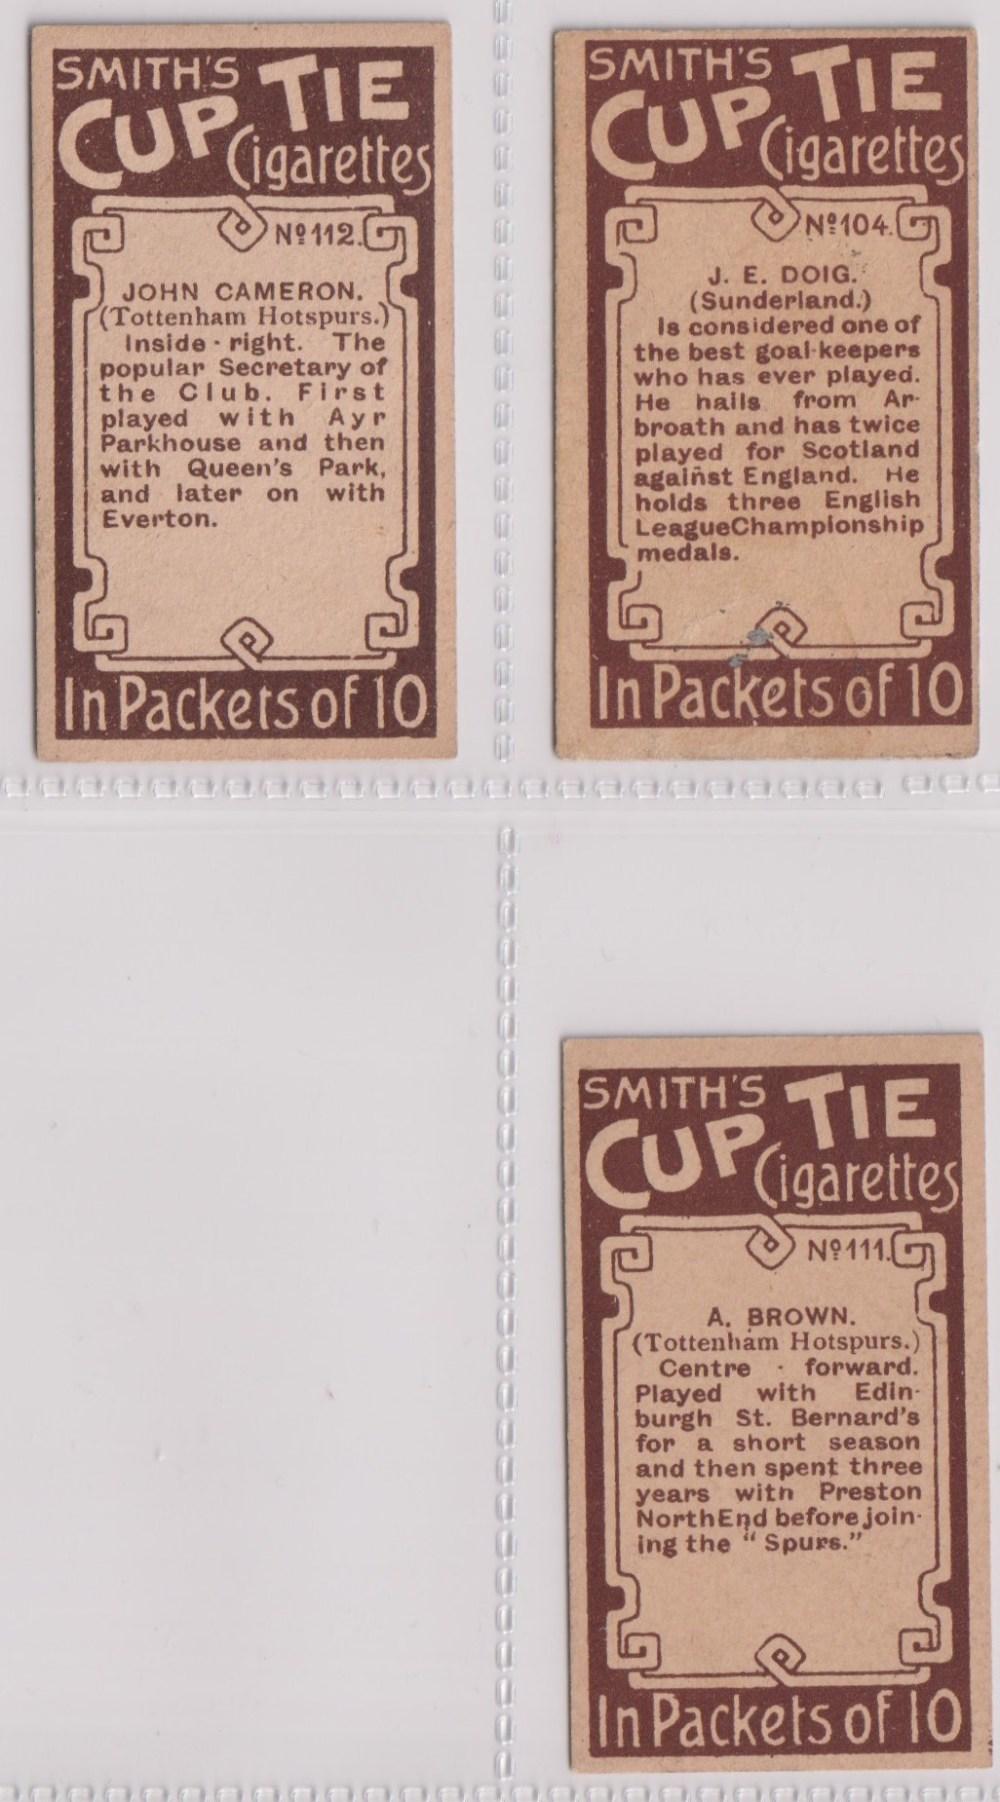 Cigarette cards, Smith's, Footballers (Brown back) 3 cards nos 104, (sl corner crease), 111, & - Image 2 of 2